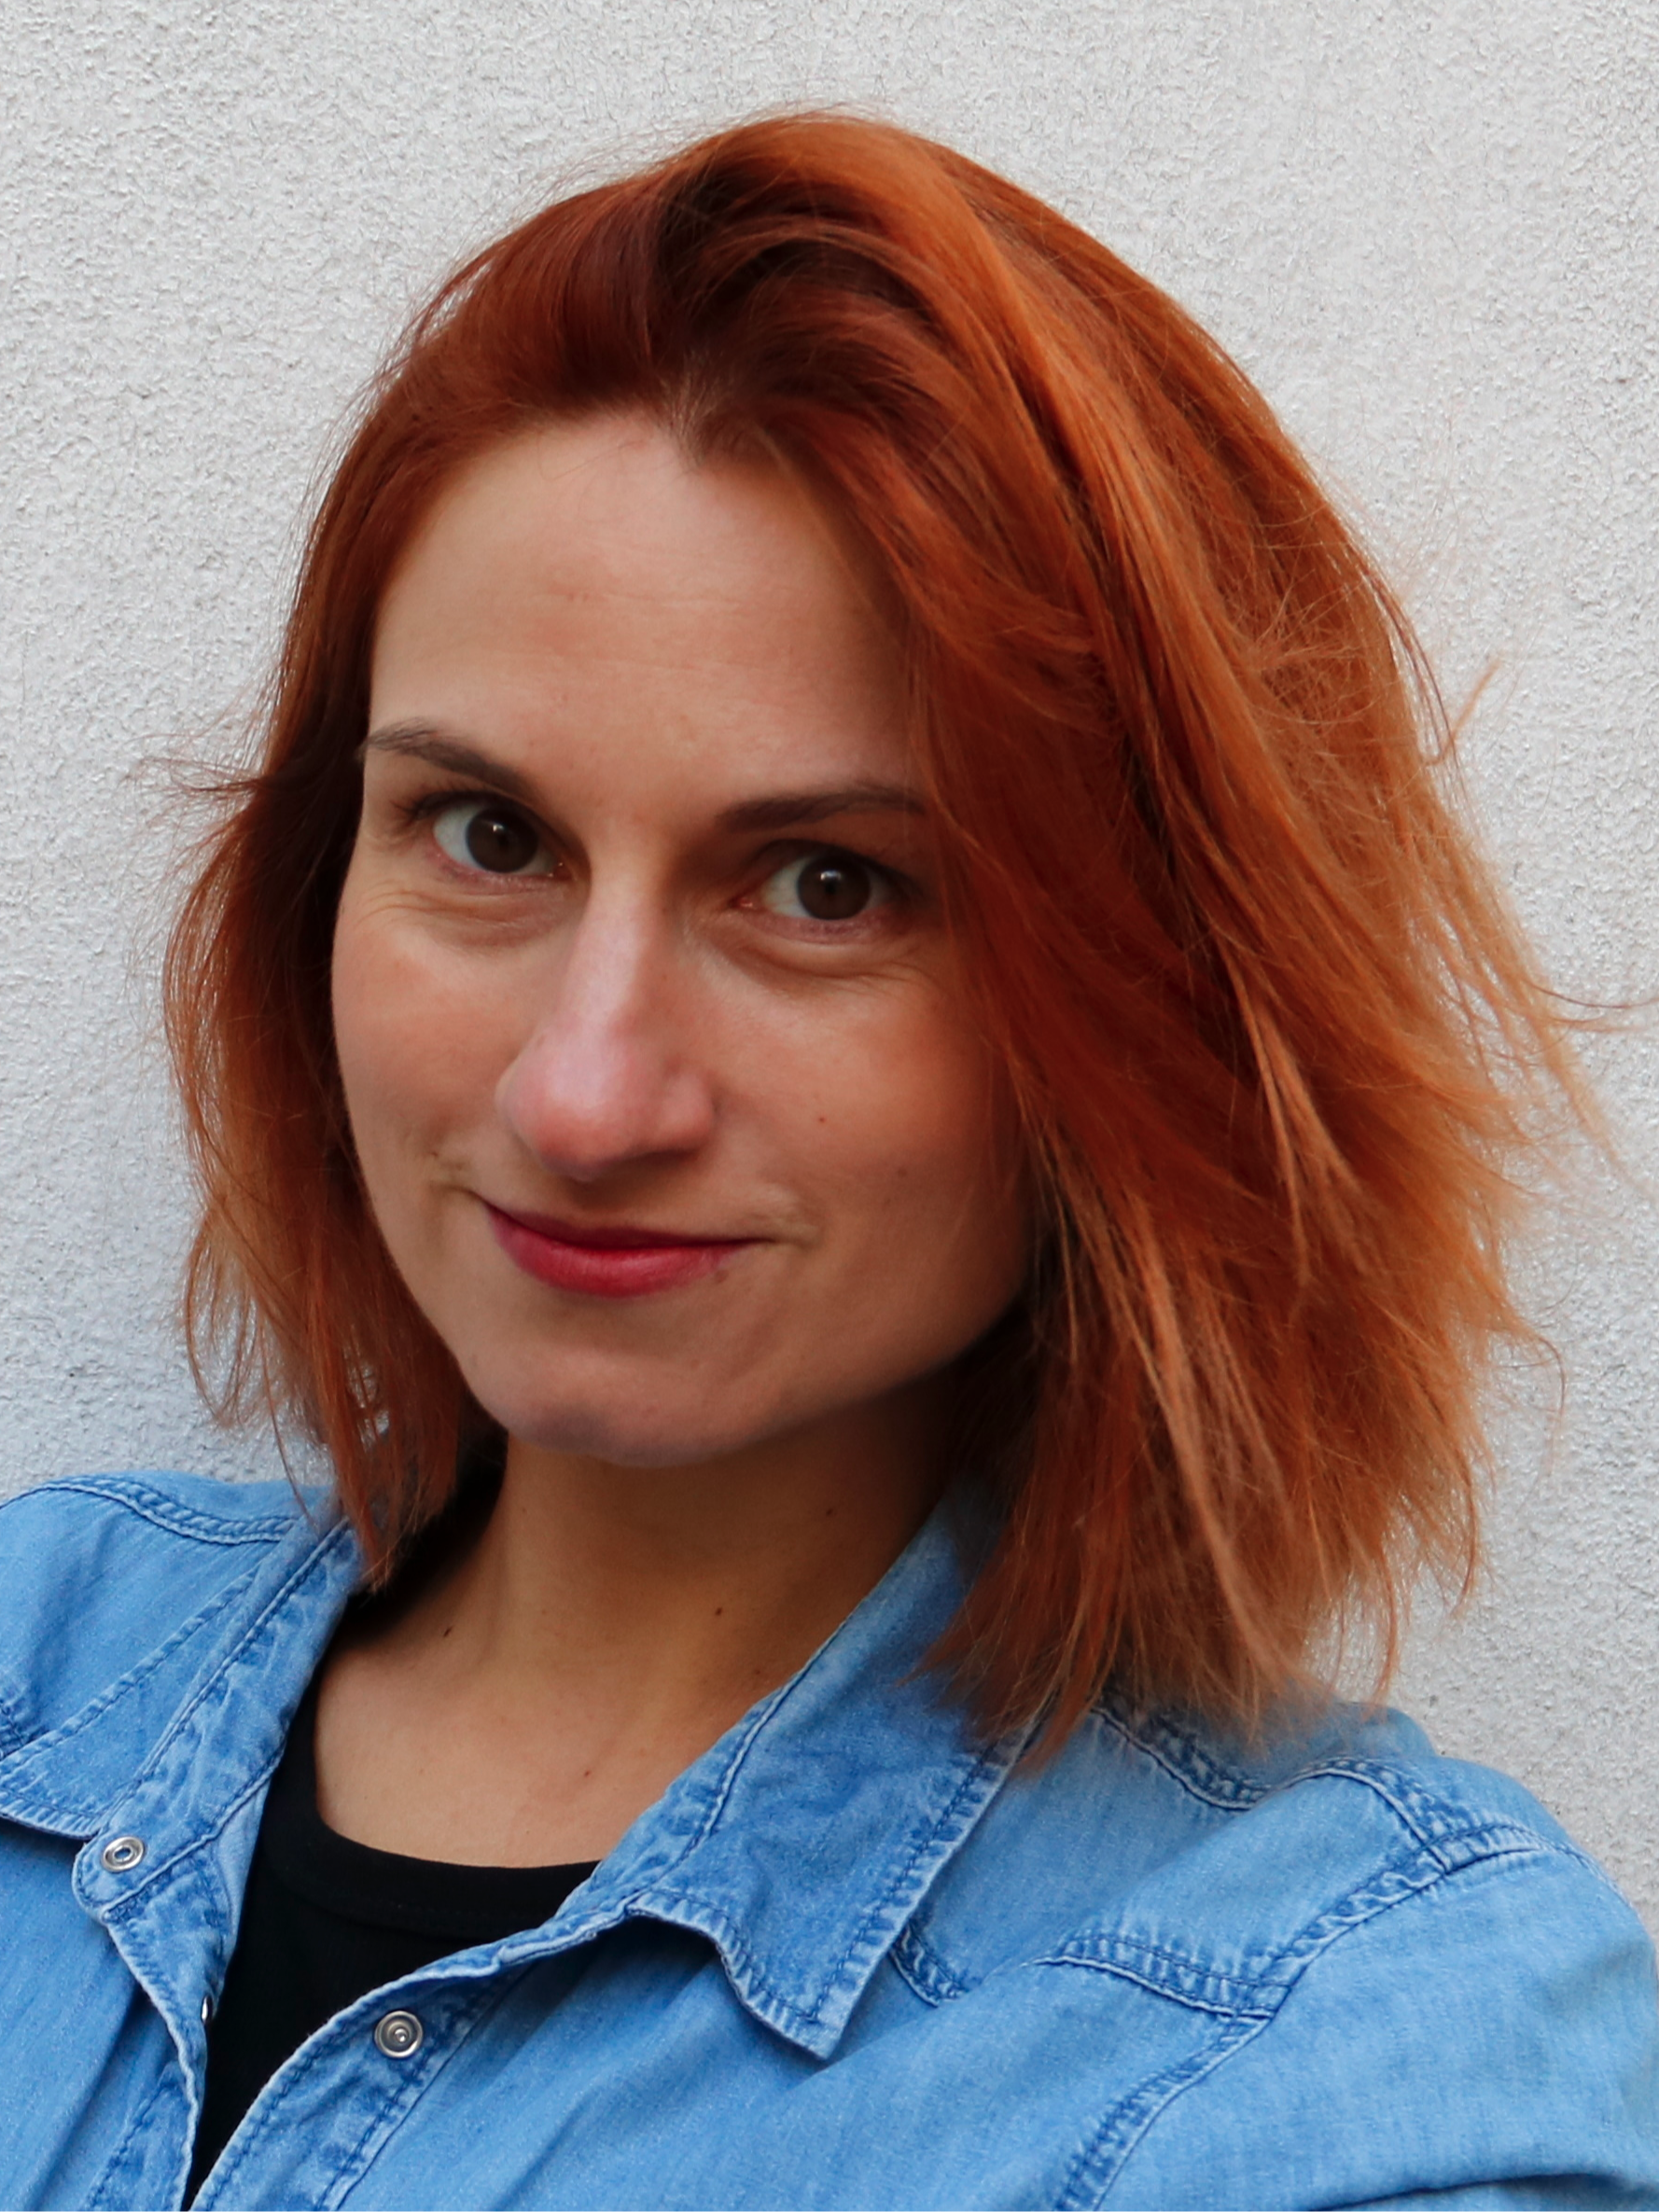 Justine Paillot